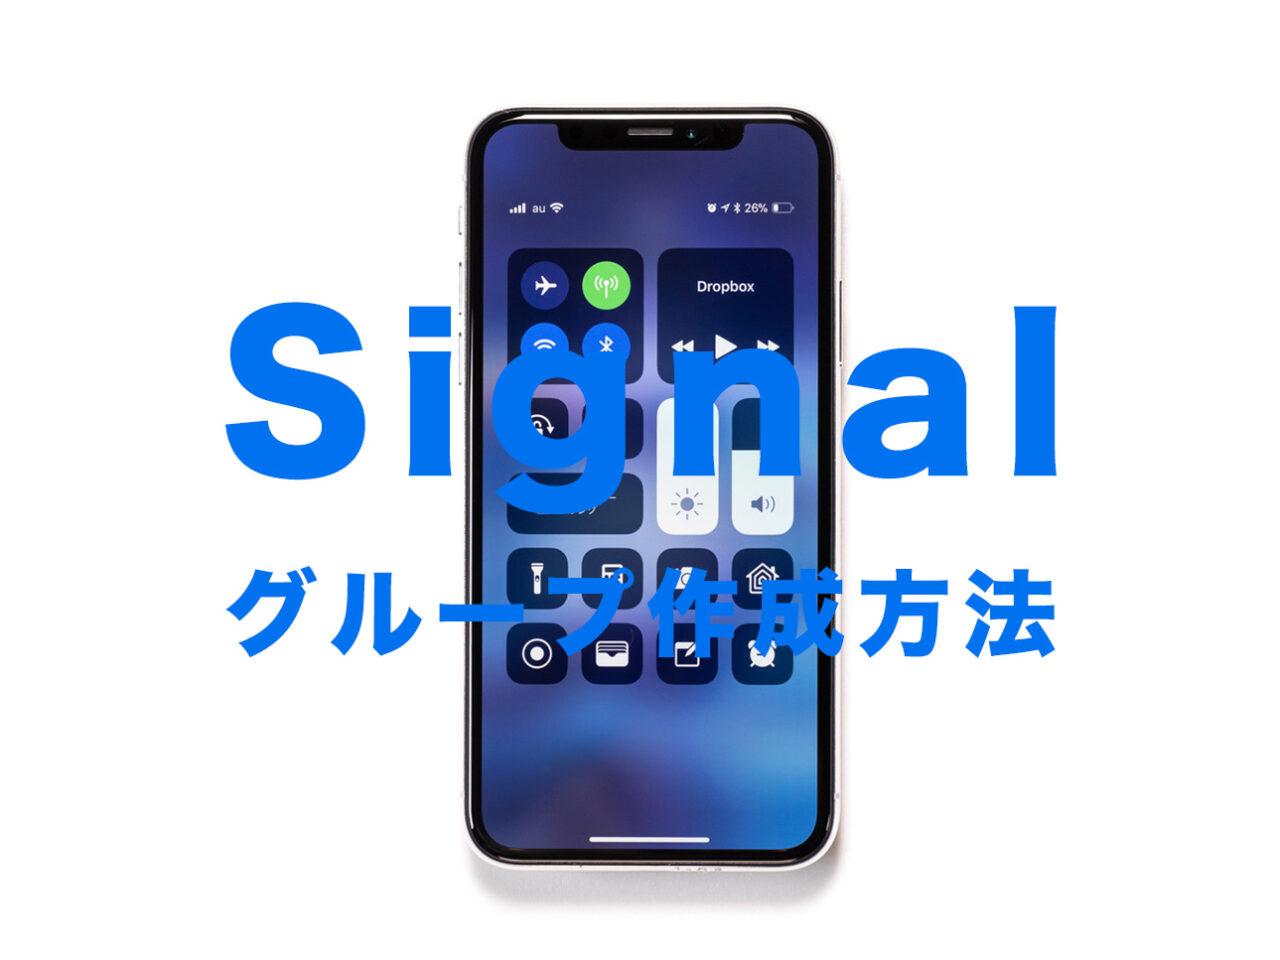 Signal(シグナル)でグループの作り方&作成方法は?【メッセージアプリ】のサムネイル画像